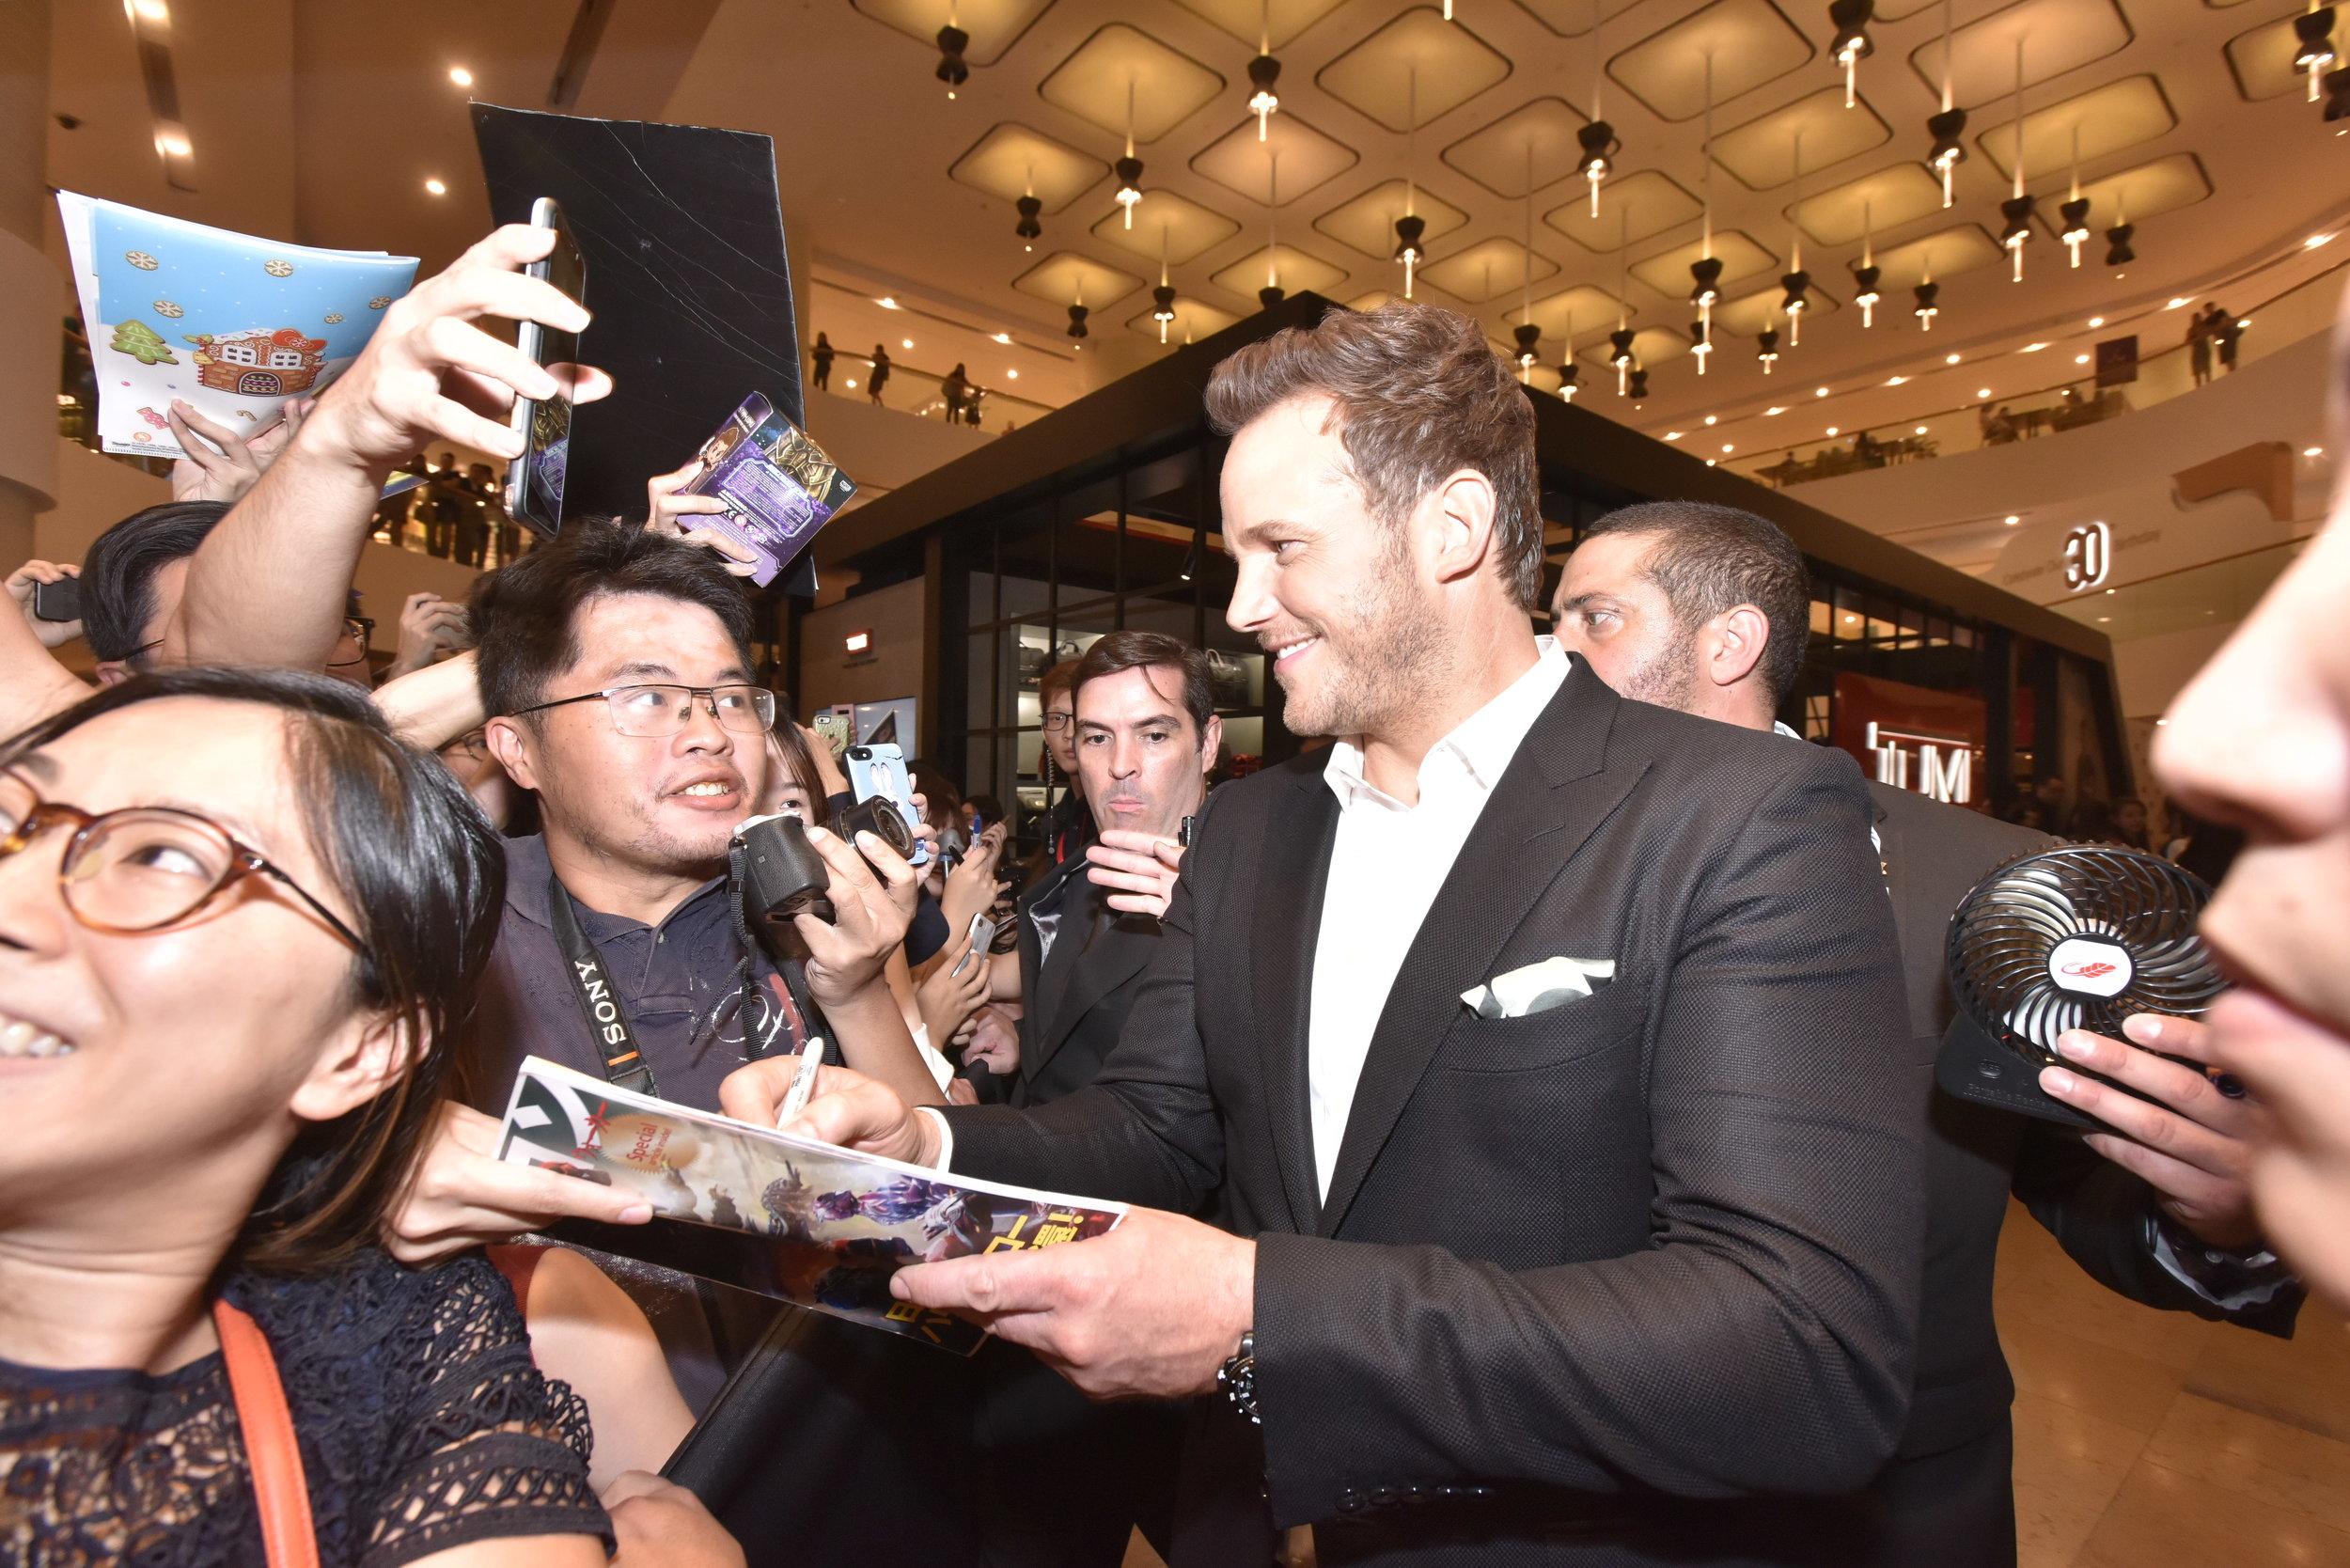 DSC_8838_Chris Pratt signing autographs.JPG